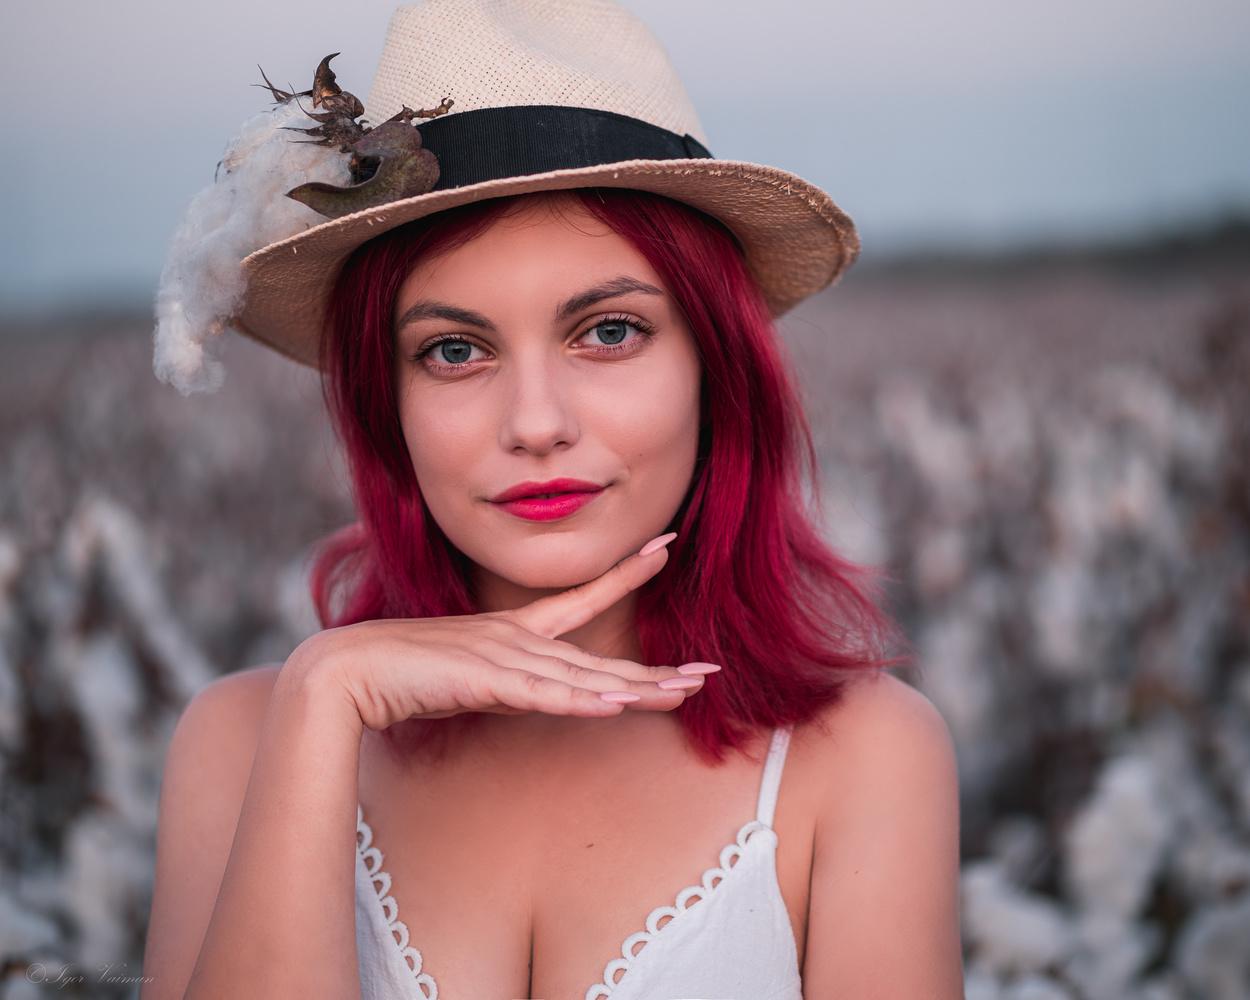 Cotton blossom 4 by Igor Vaiman